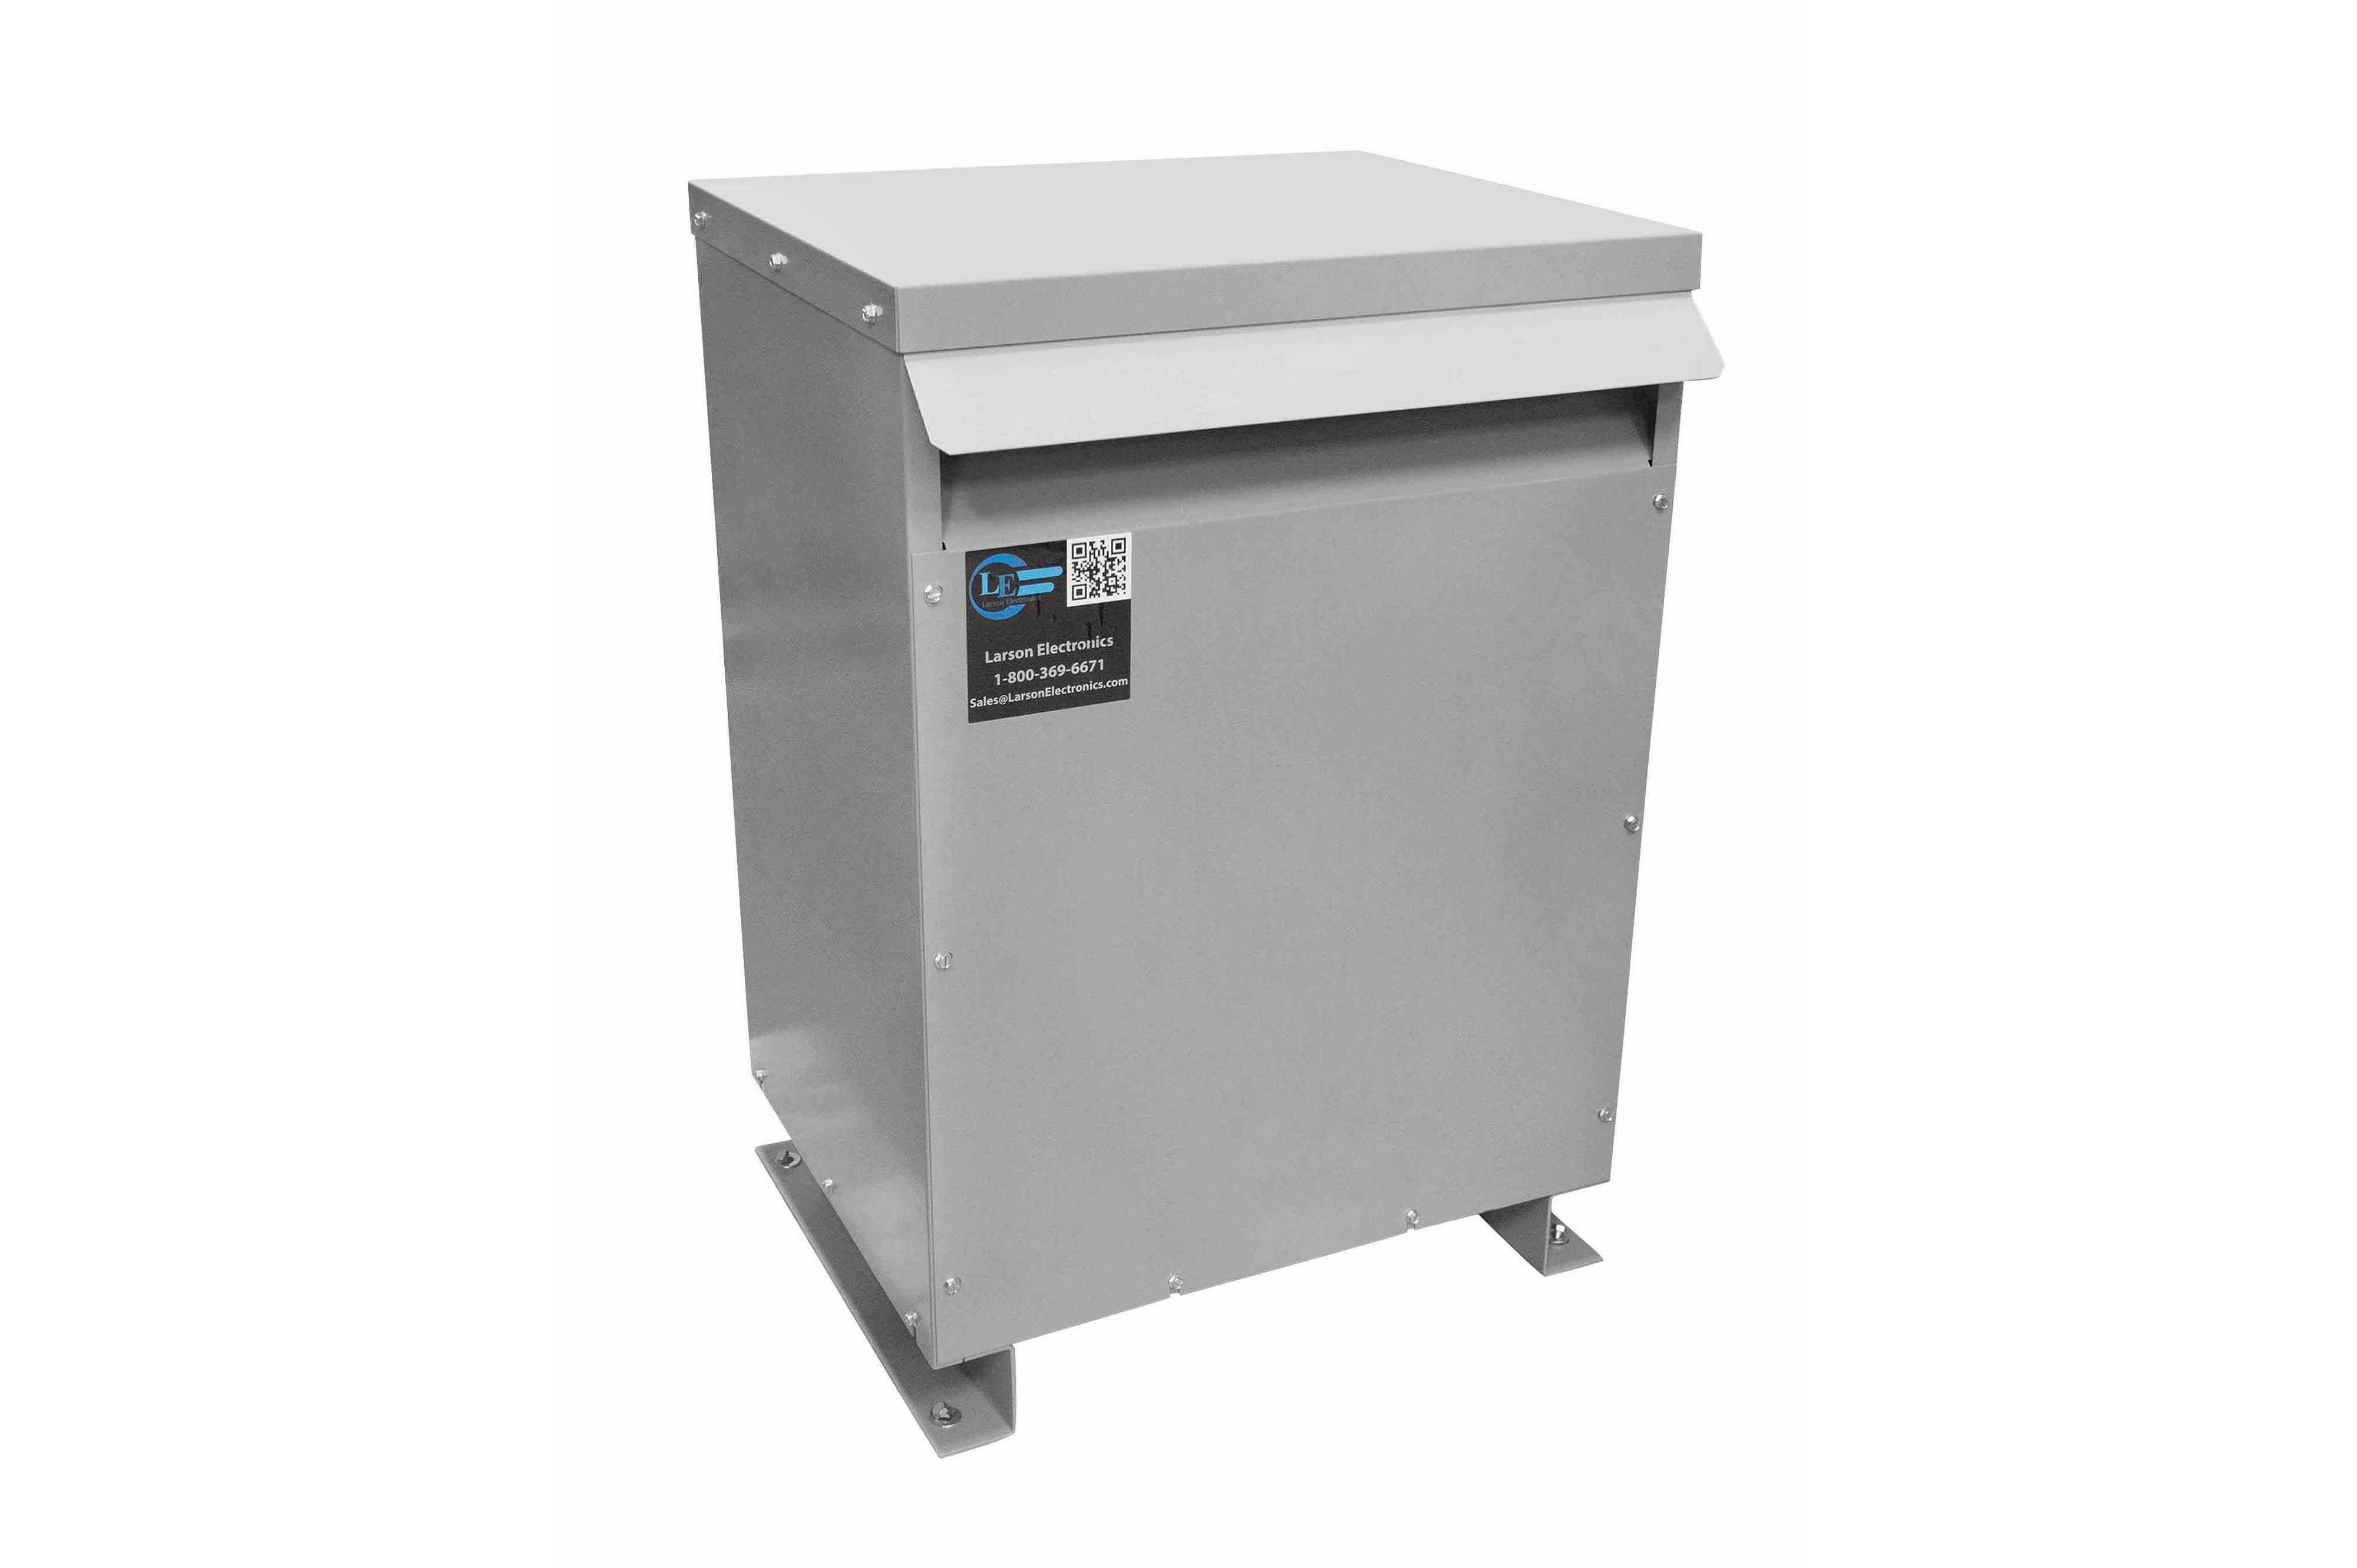 47.5 kVA 3PH Isolation Transformer, 460V Wye Primary, 400Y/231 Wye-N Secondary, N3R, Ventilated, 60 Hz